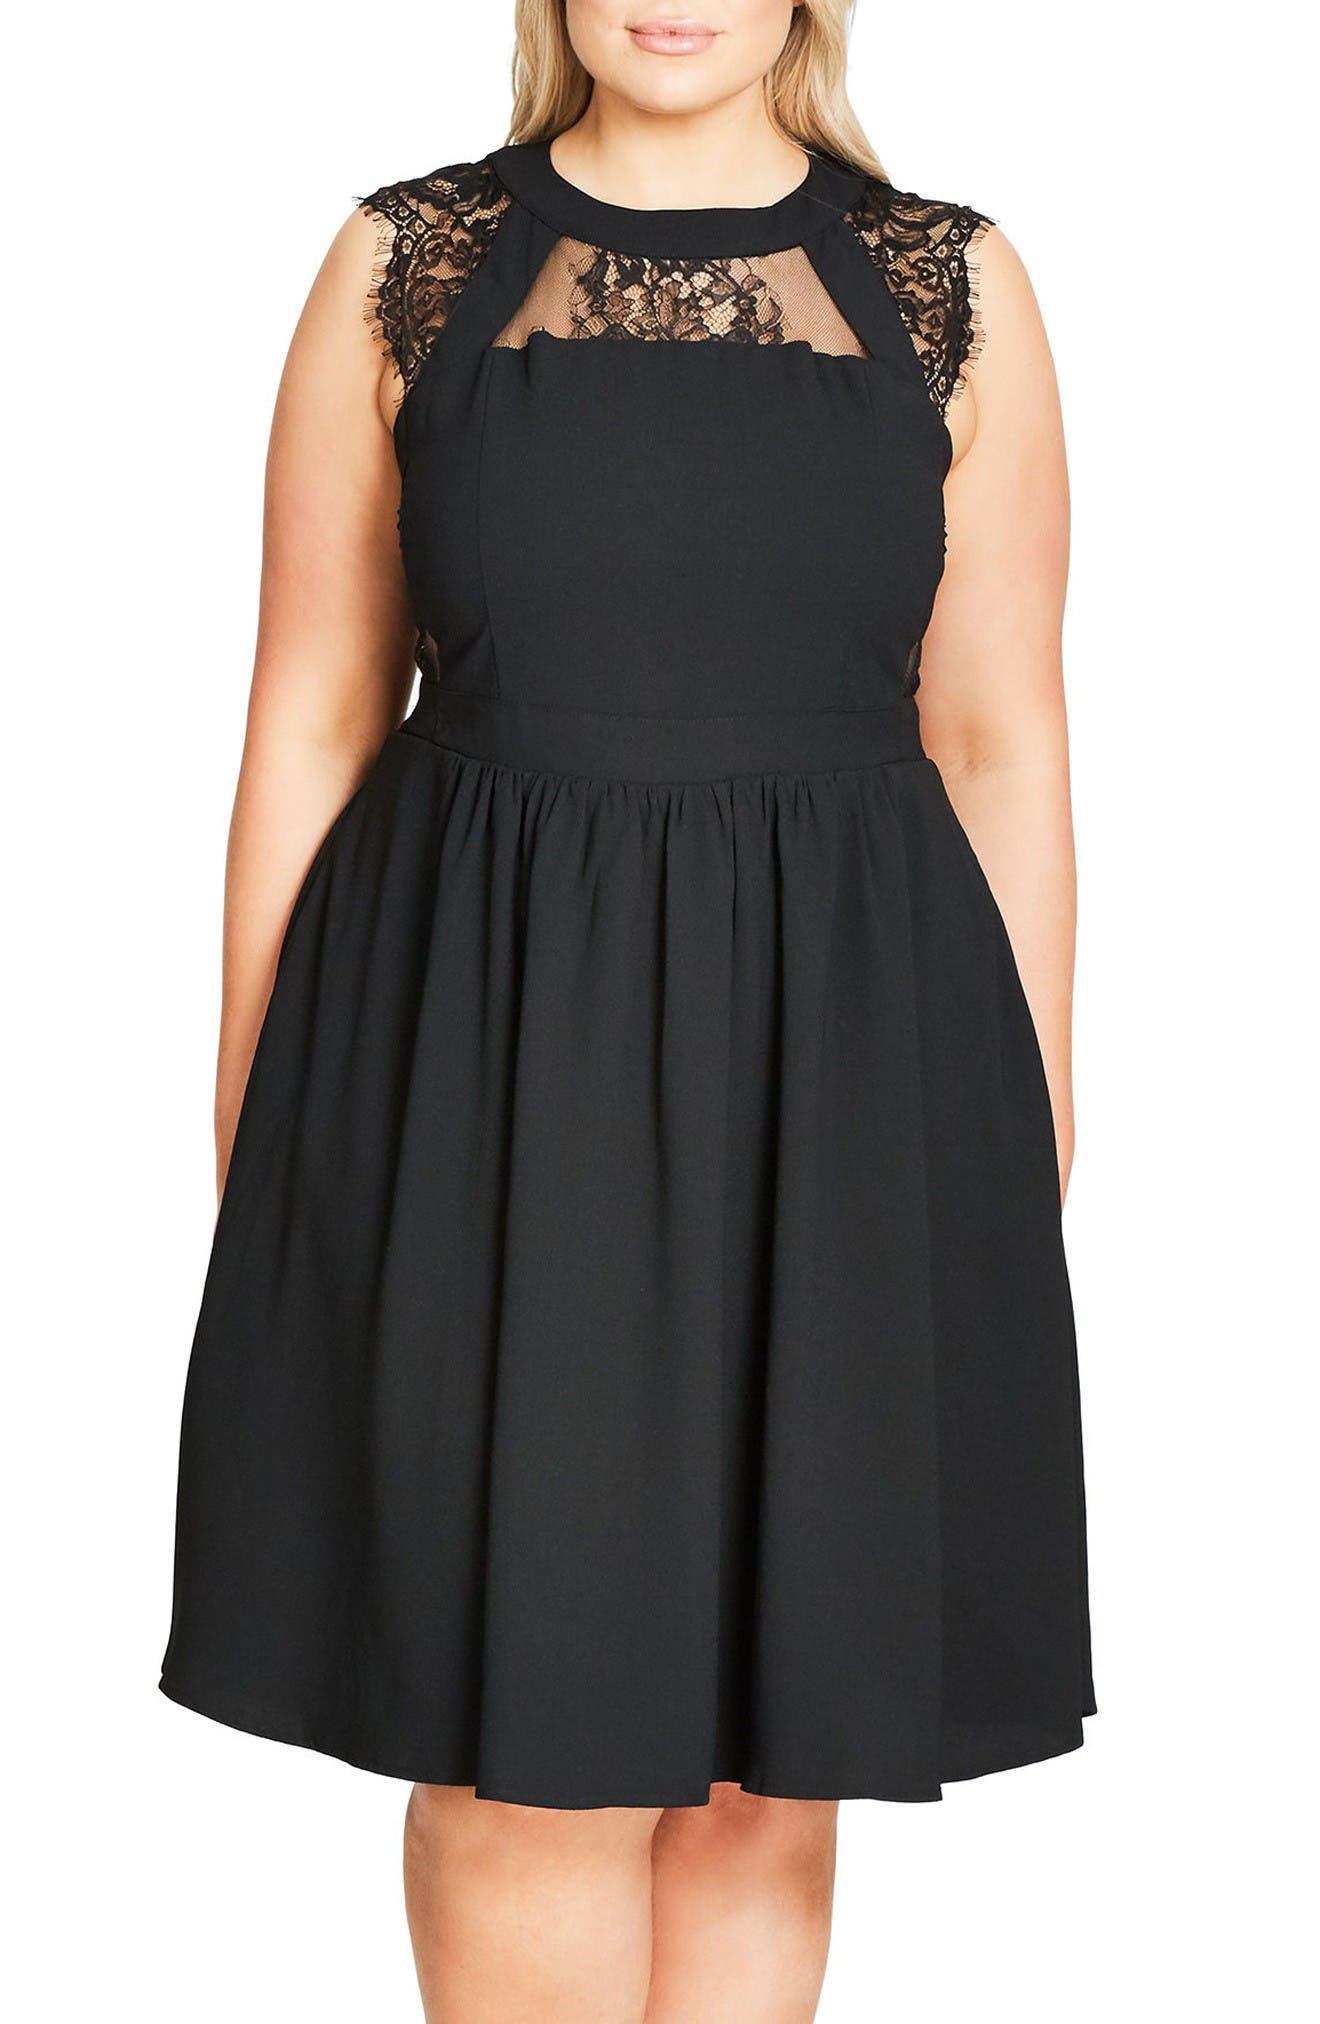 Main Image - City Chic Cage Dress (Plus Size)